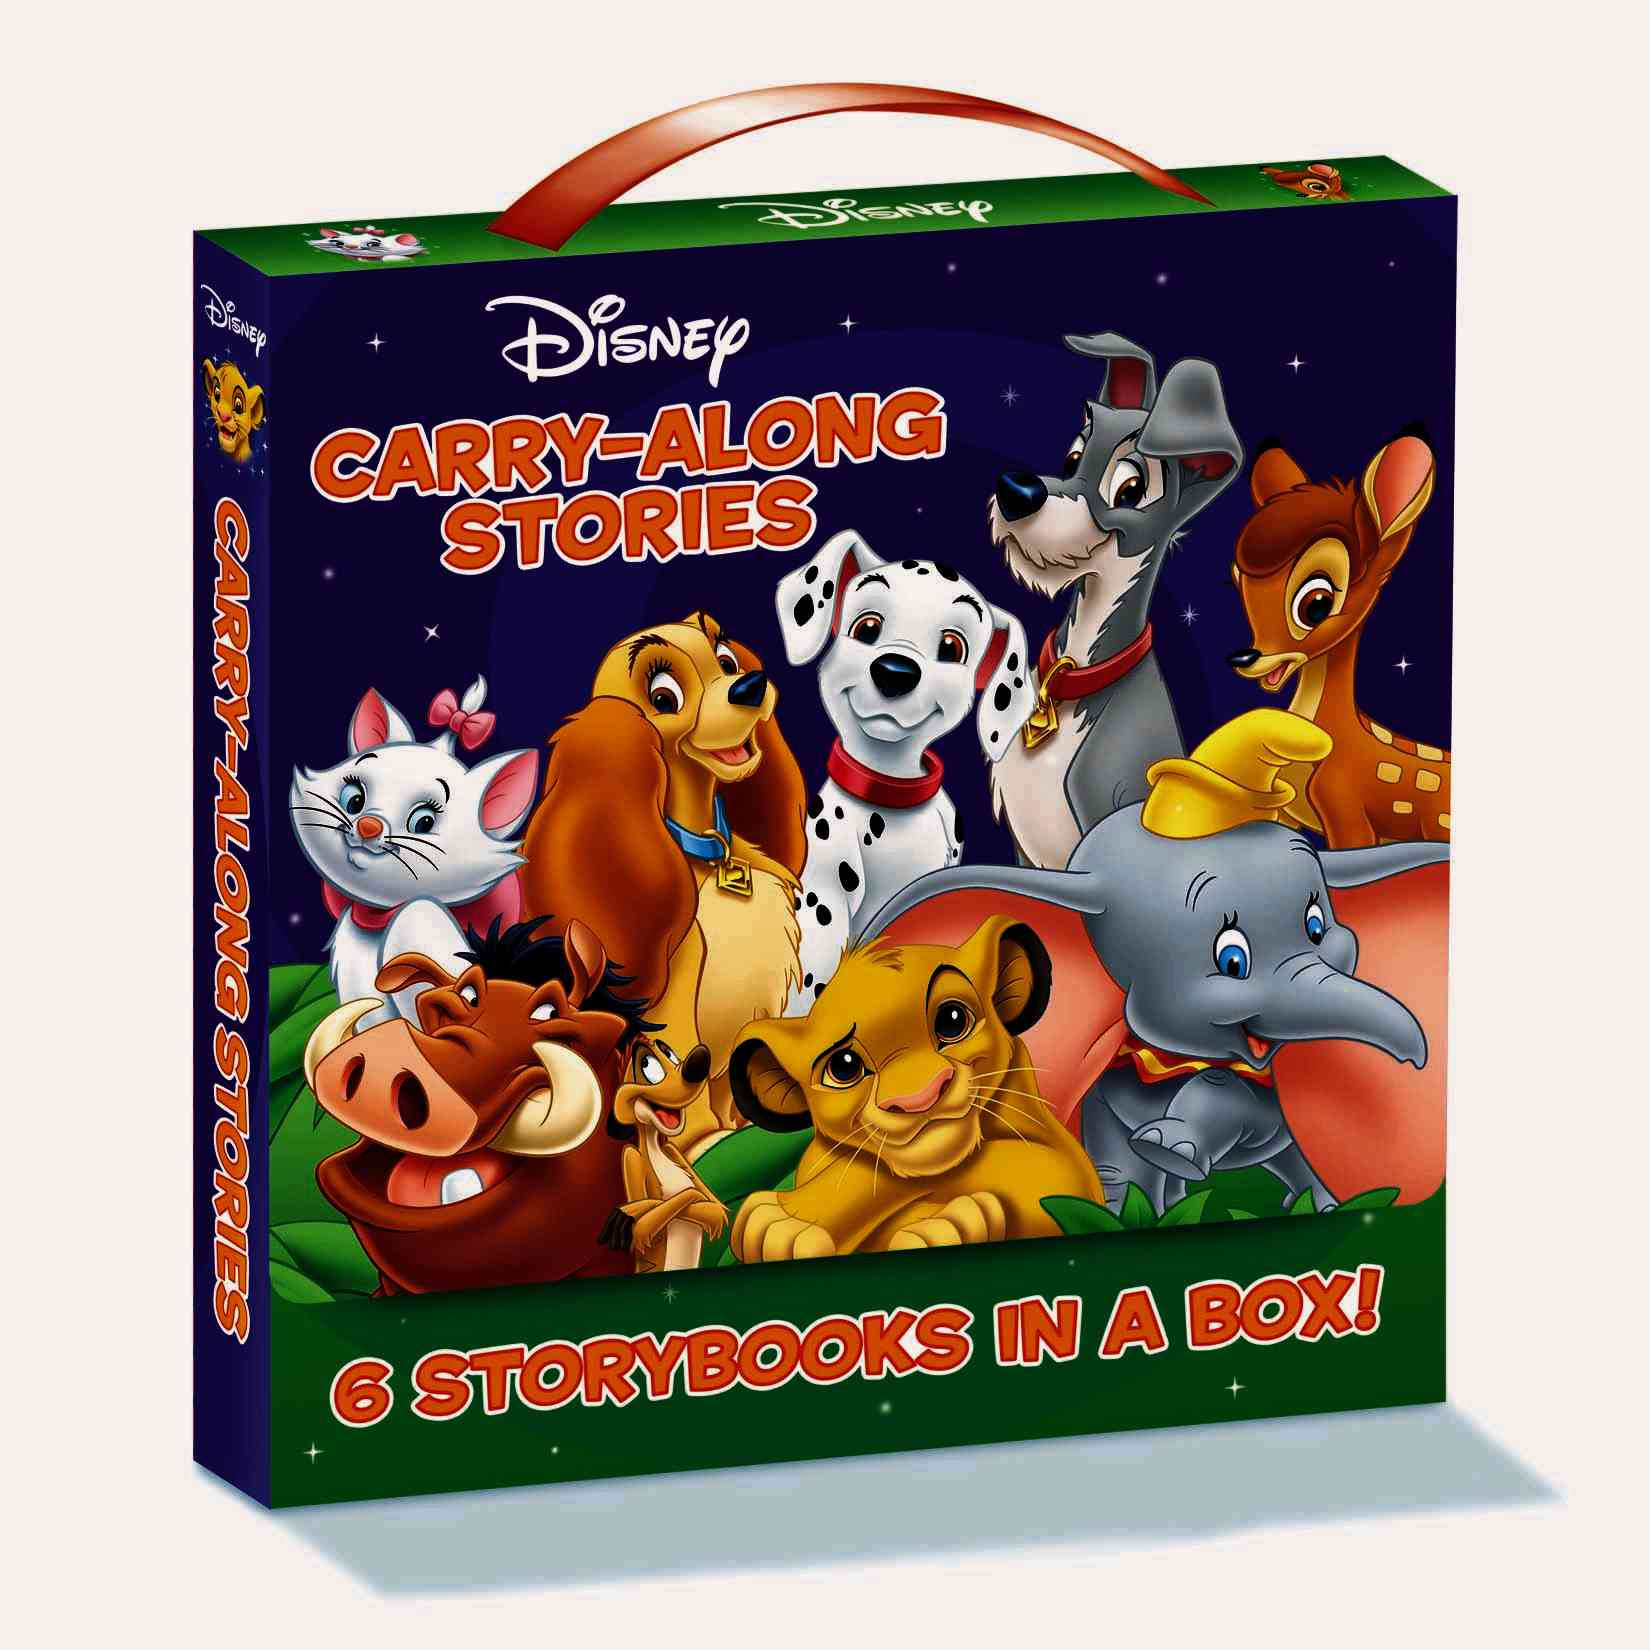 Disney Carry-Along Stories 6 Volume Boxed Set